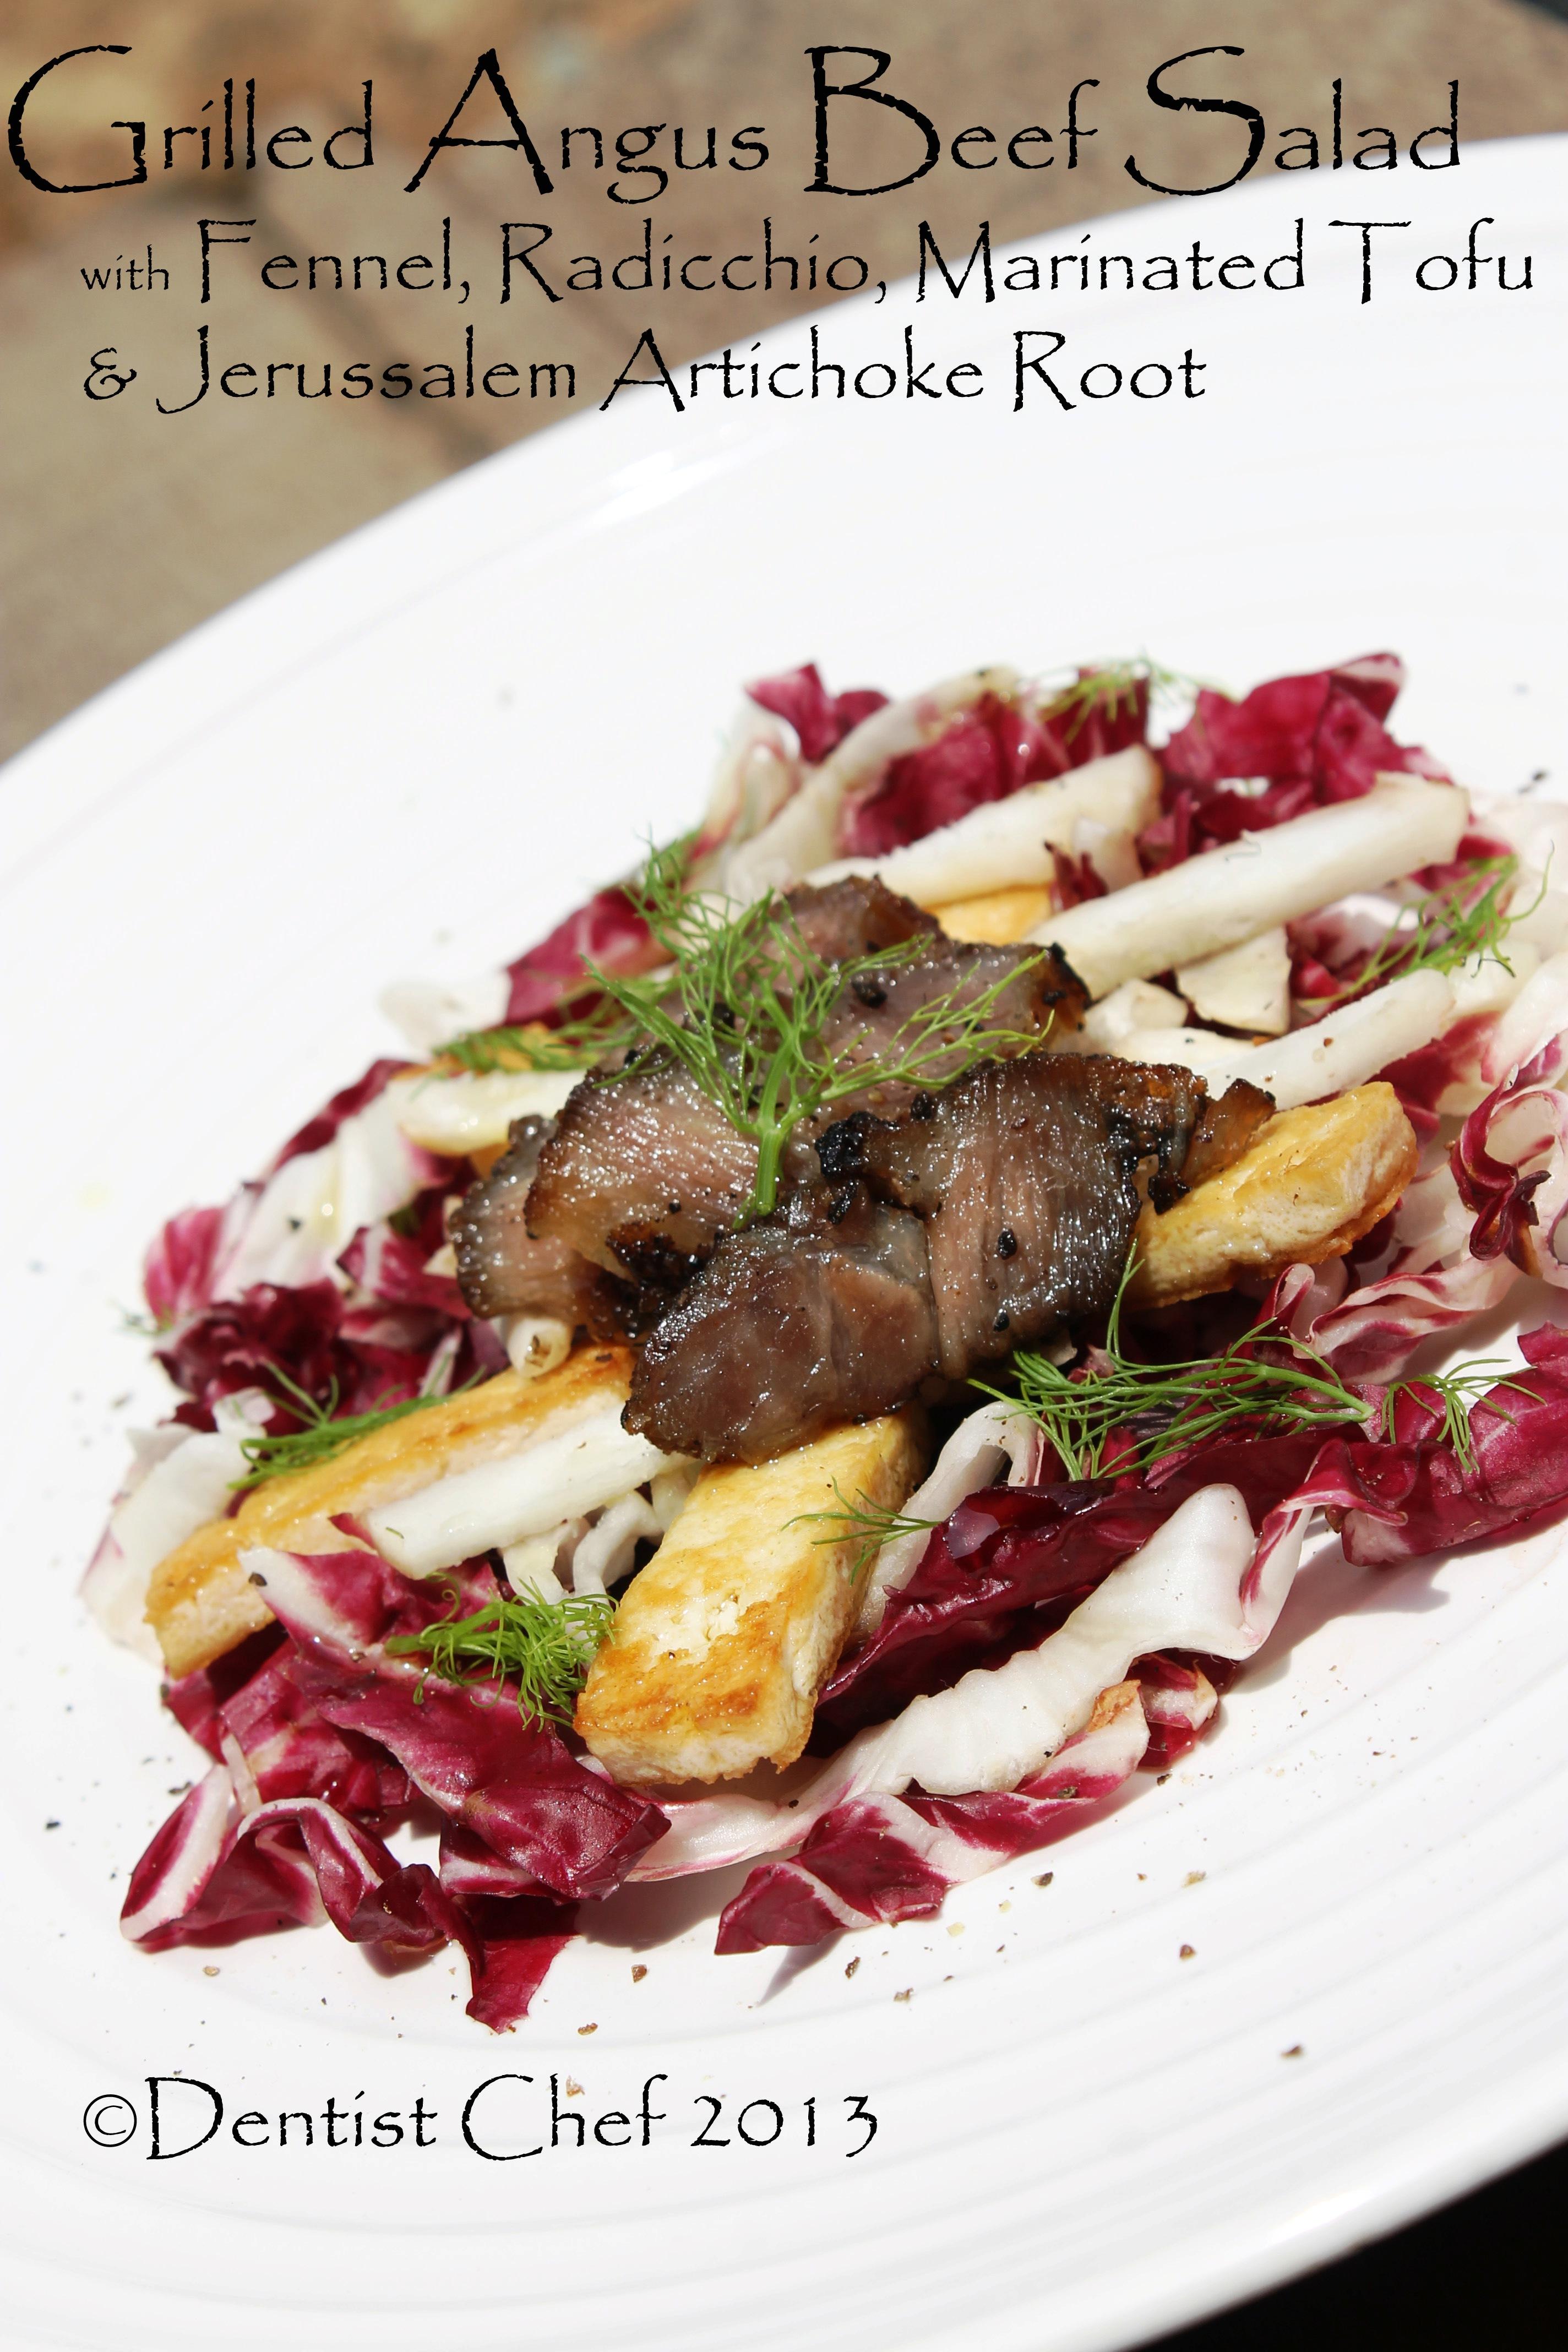 Grilled Angus Ribeye Steak with Jerussalem Artichoke, Radicchio, Tofu ...